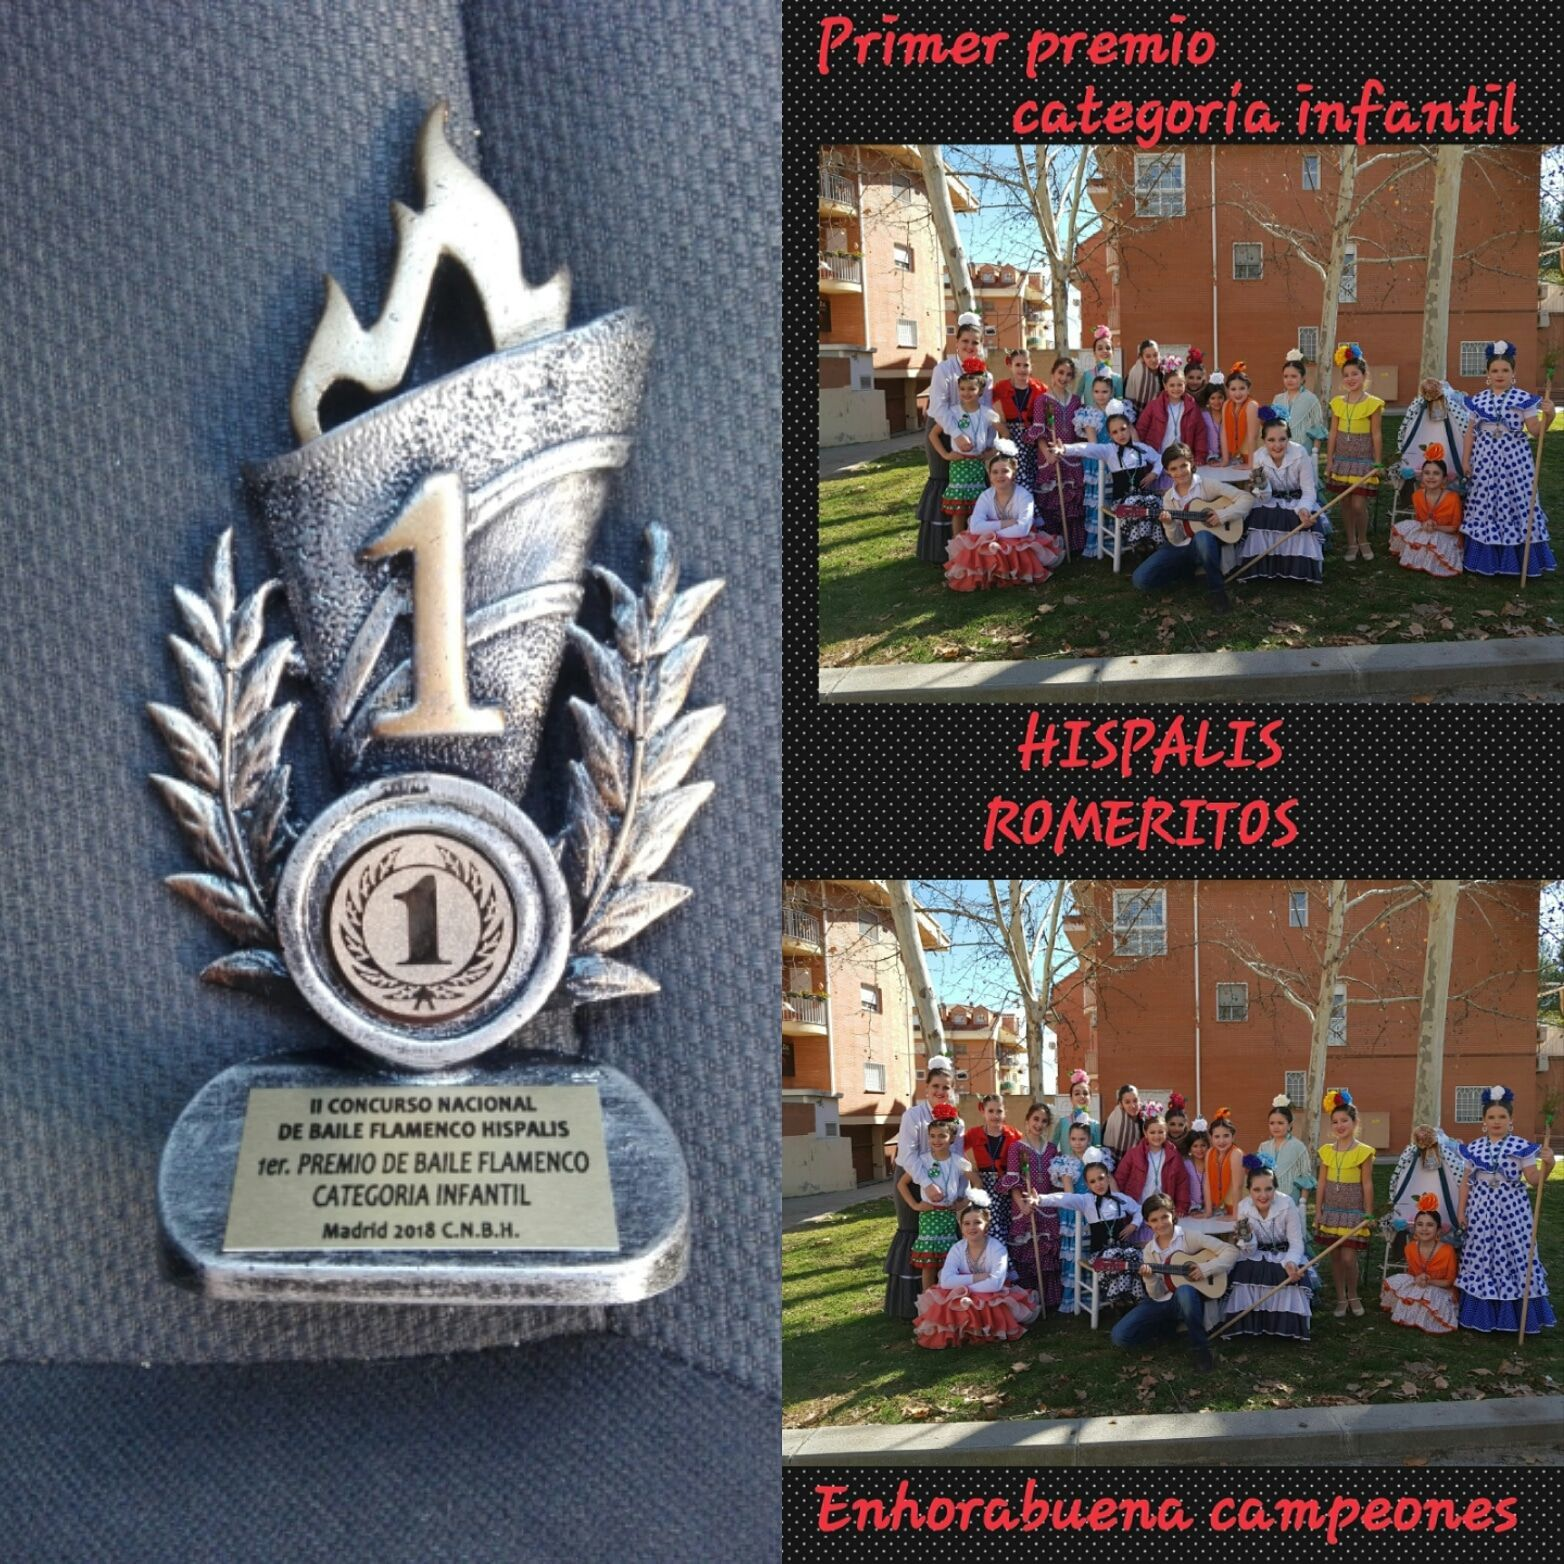 Primer premio INFANTIL Concurso Nacional de Baile Hispalis 2018